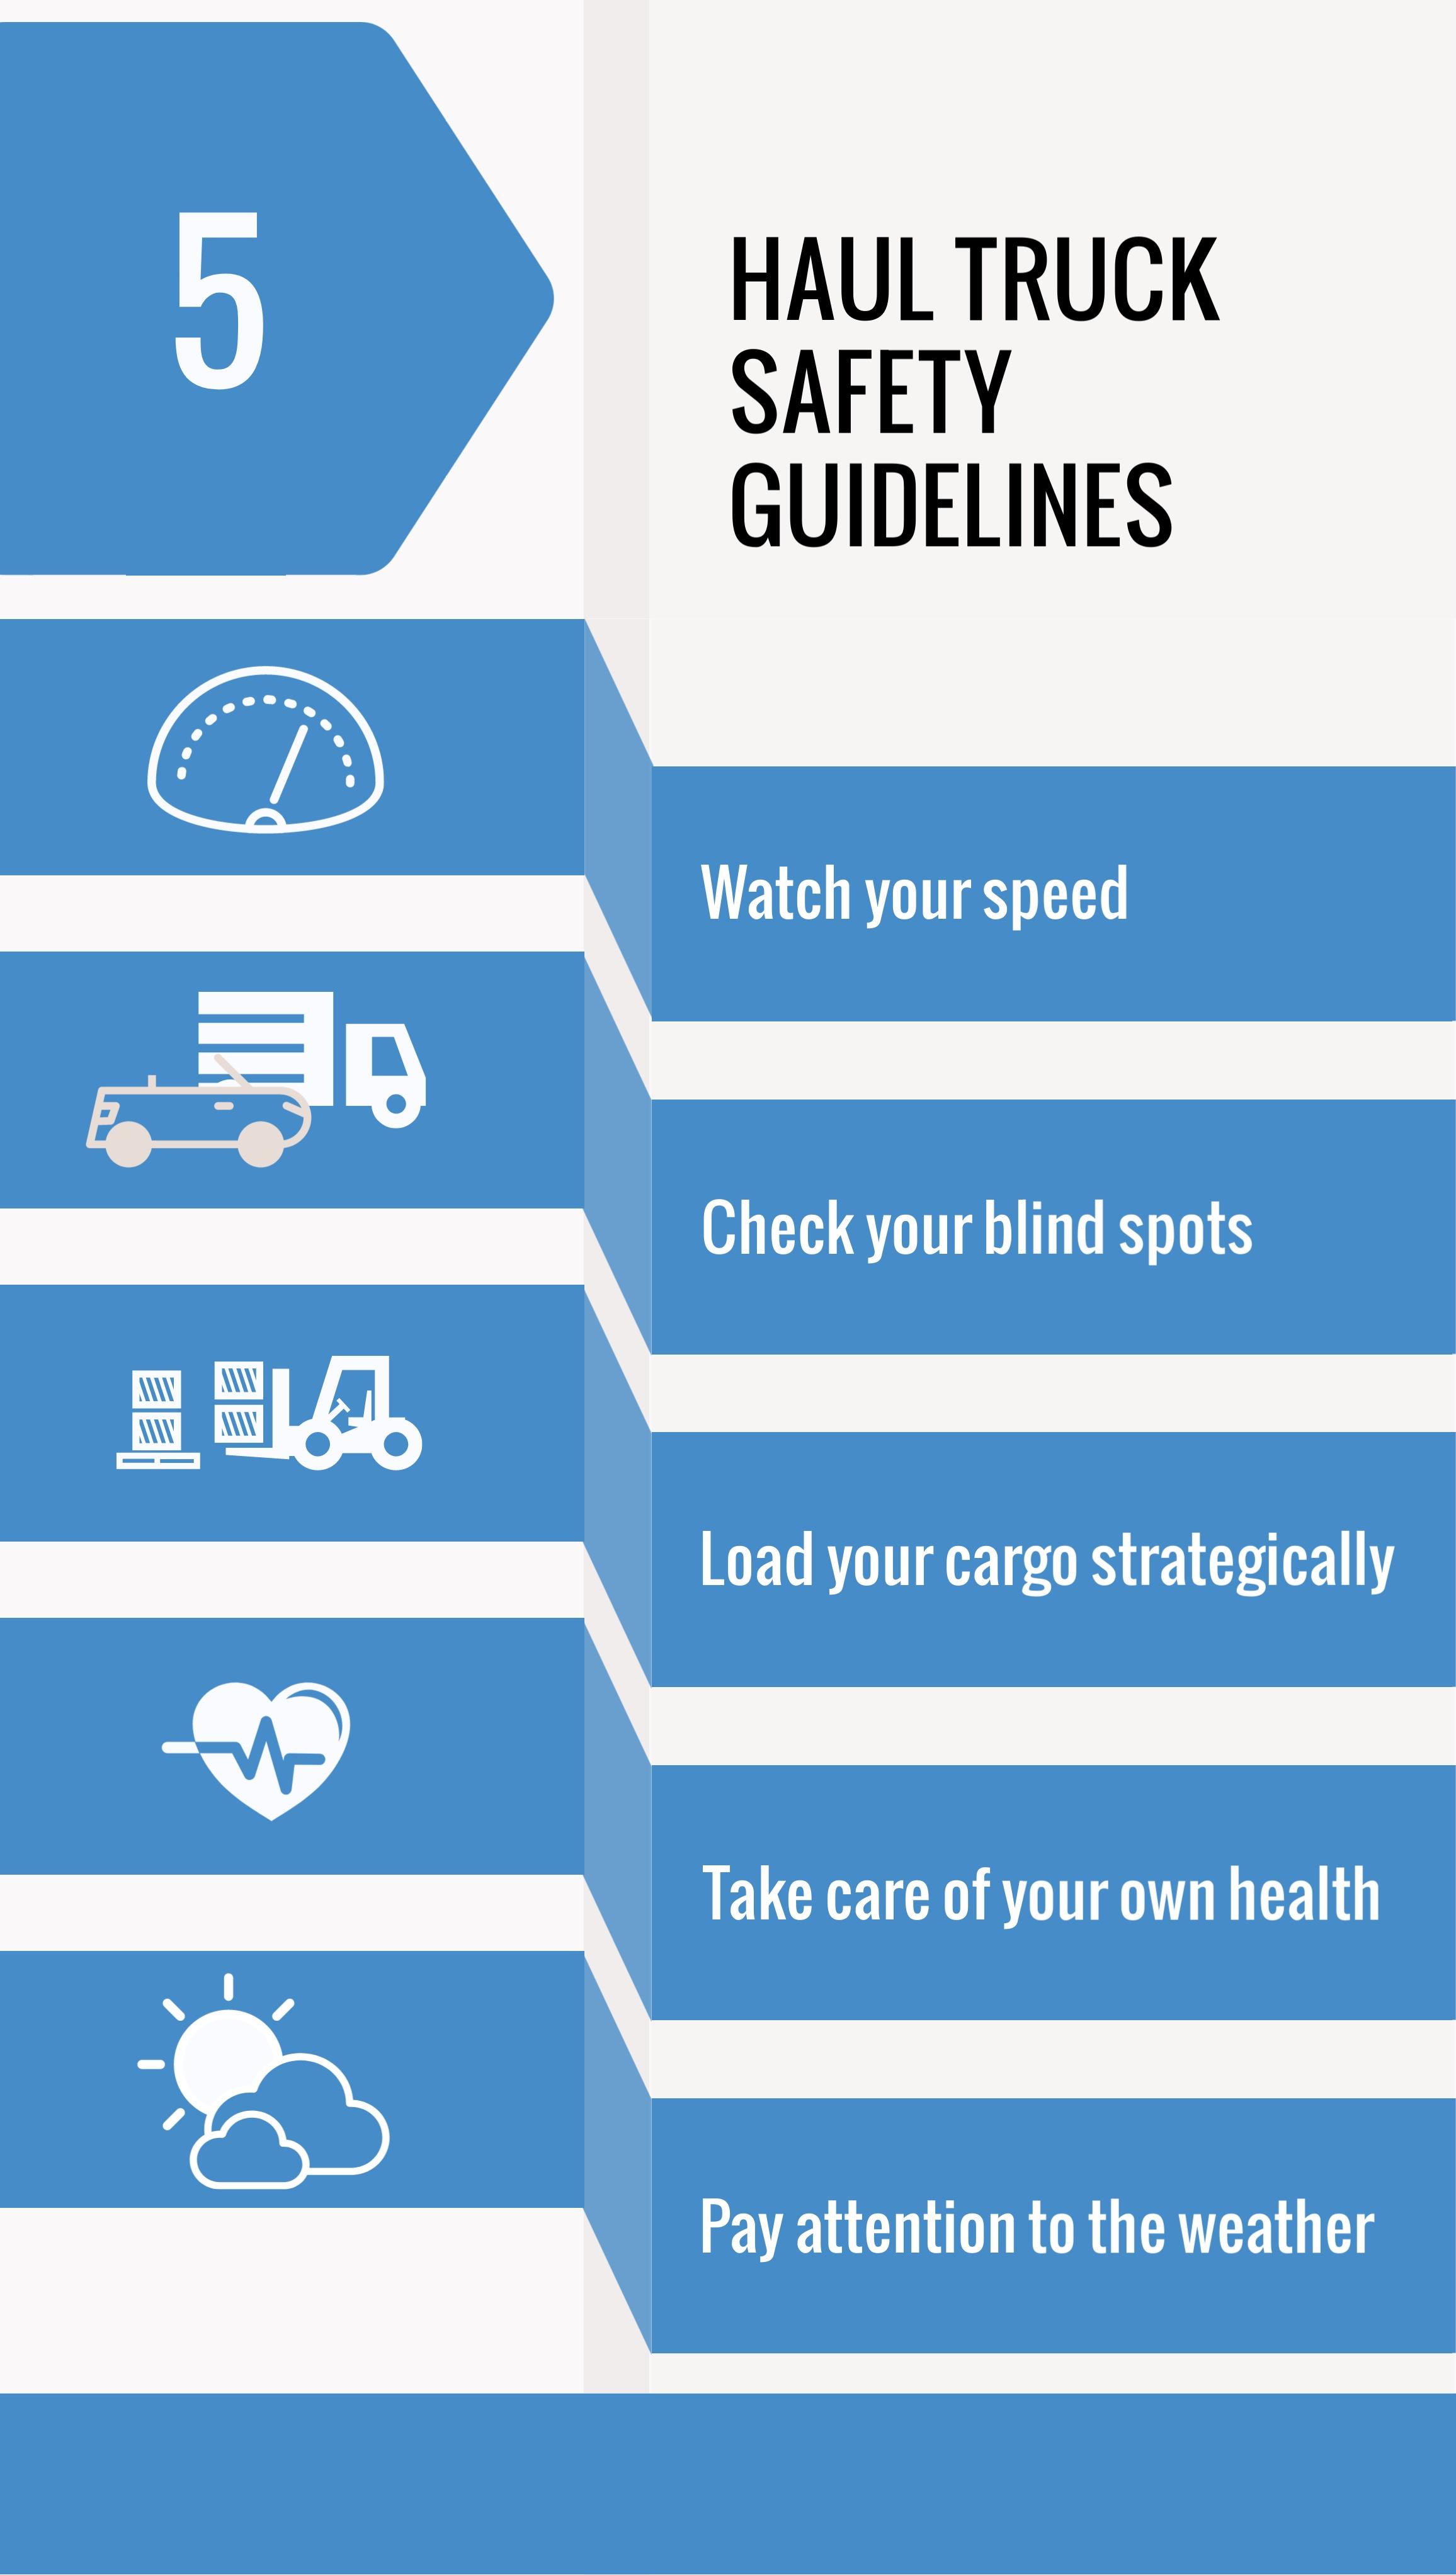 5 Haul Truck Safety Guidelines, Copeland International, Houston